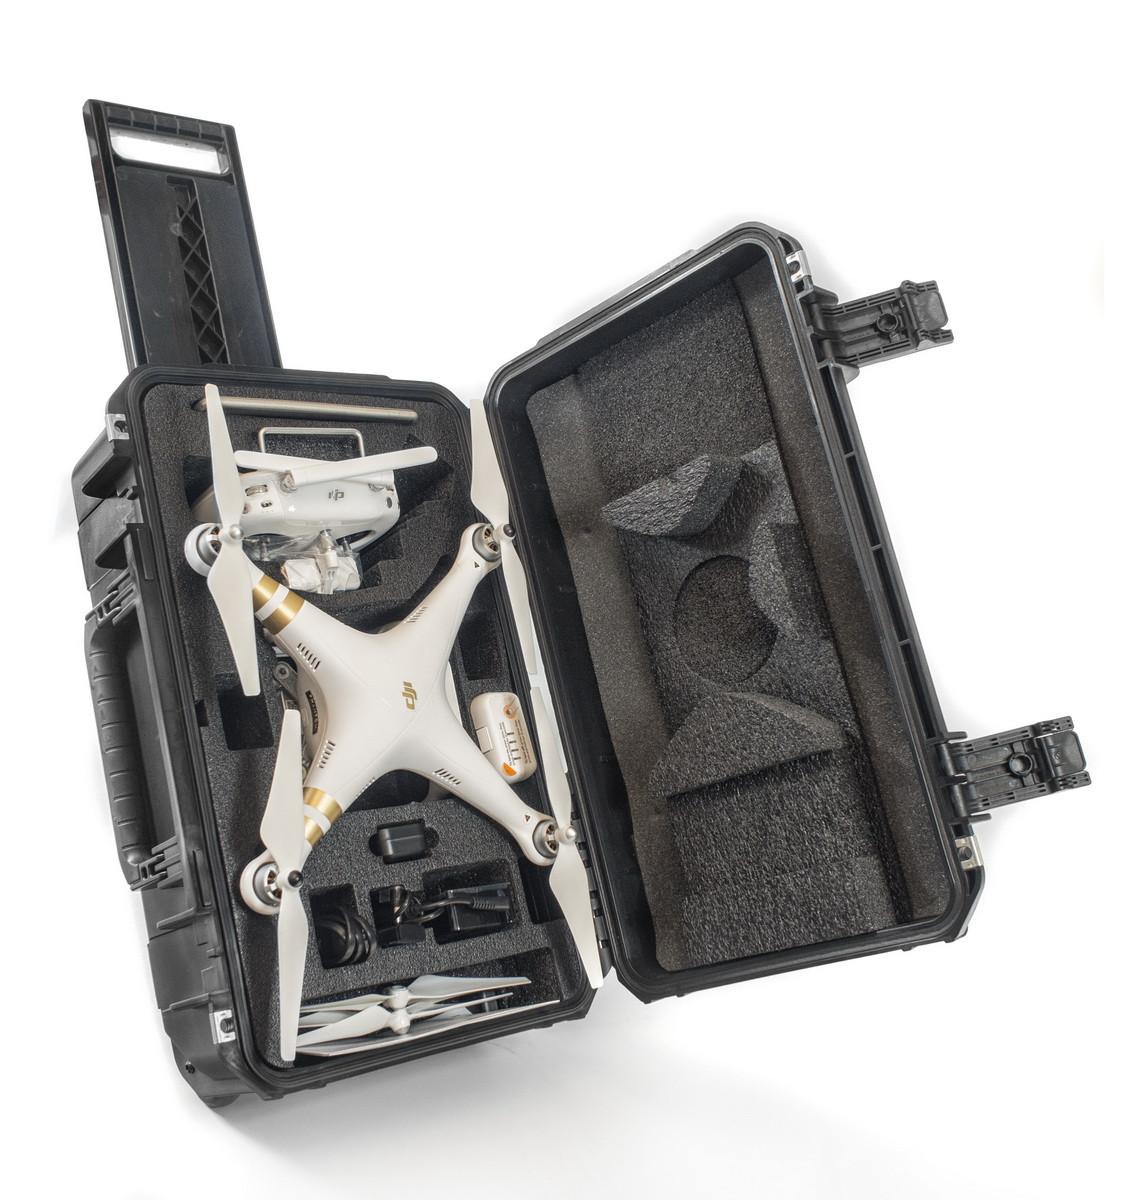 CasePro DJI Phantom 3 Drone Wheeled Carry-On Hard Case (CP-PHAN3-CO)